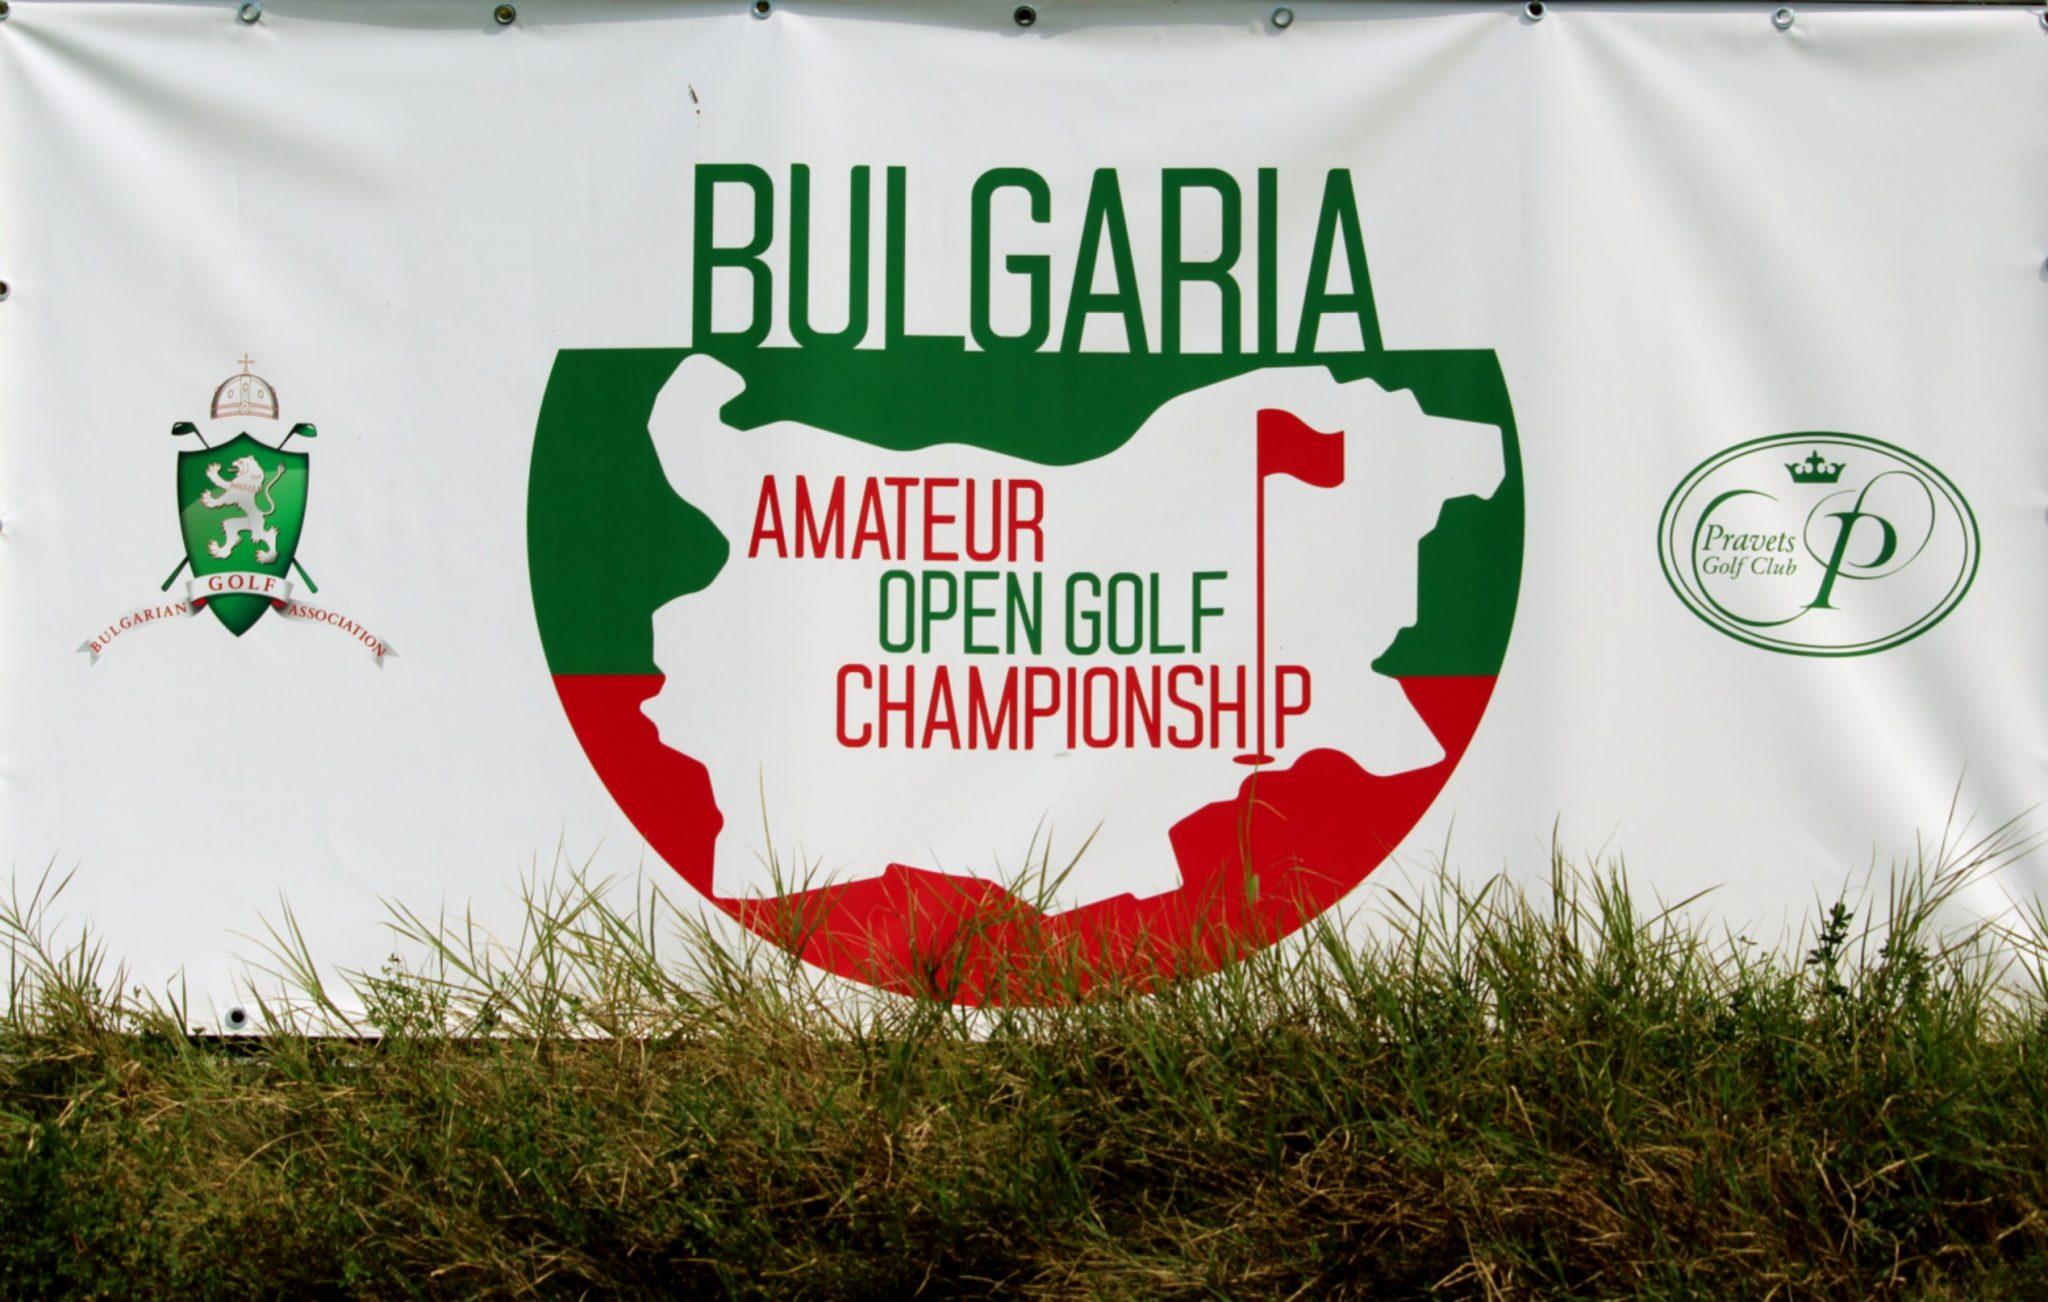 Bulgaria Amateur Open Golf Championship (71)